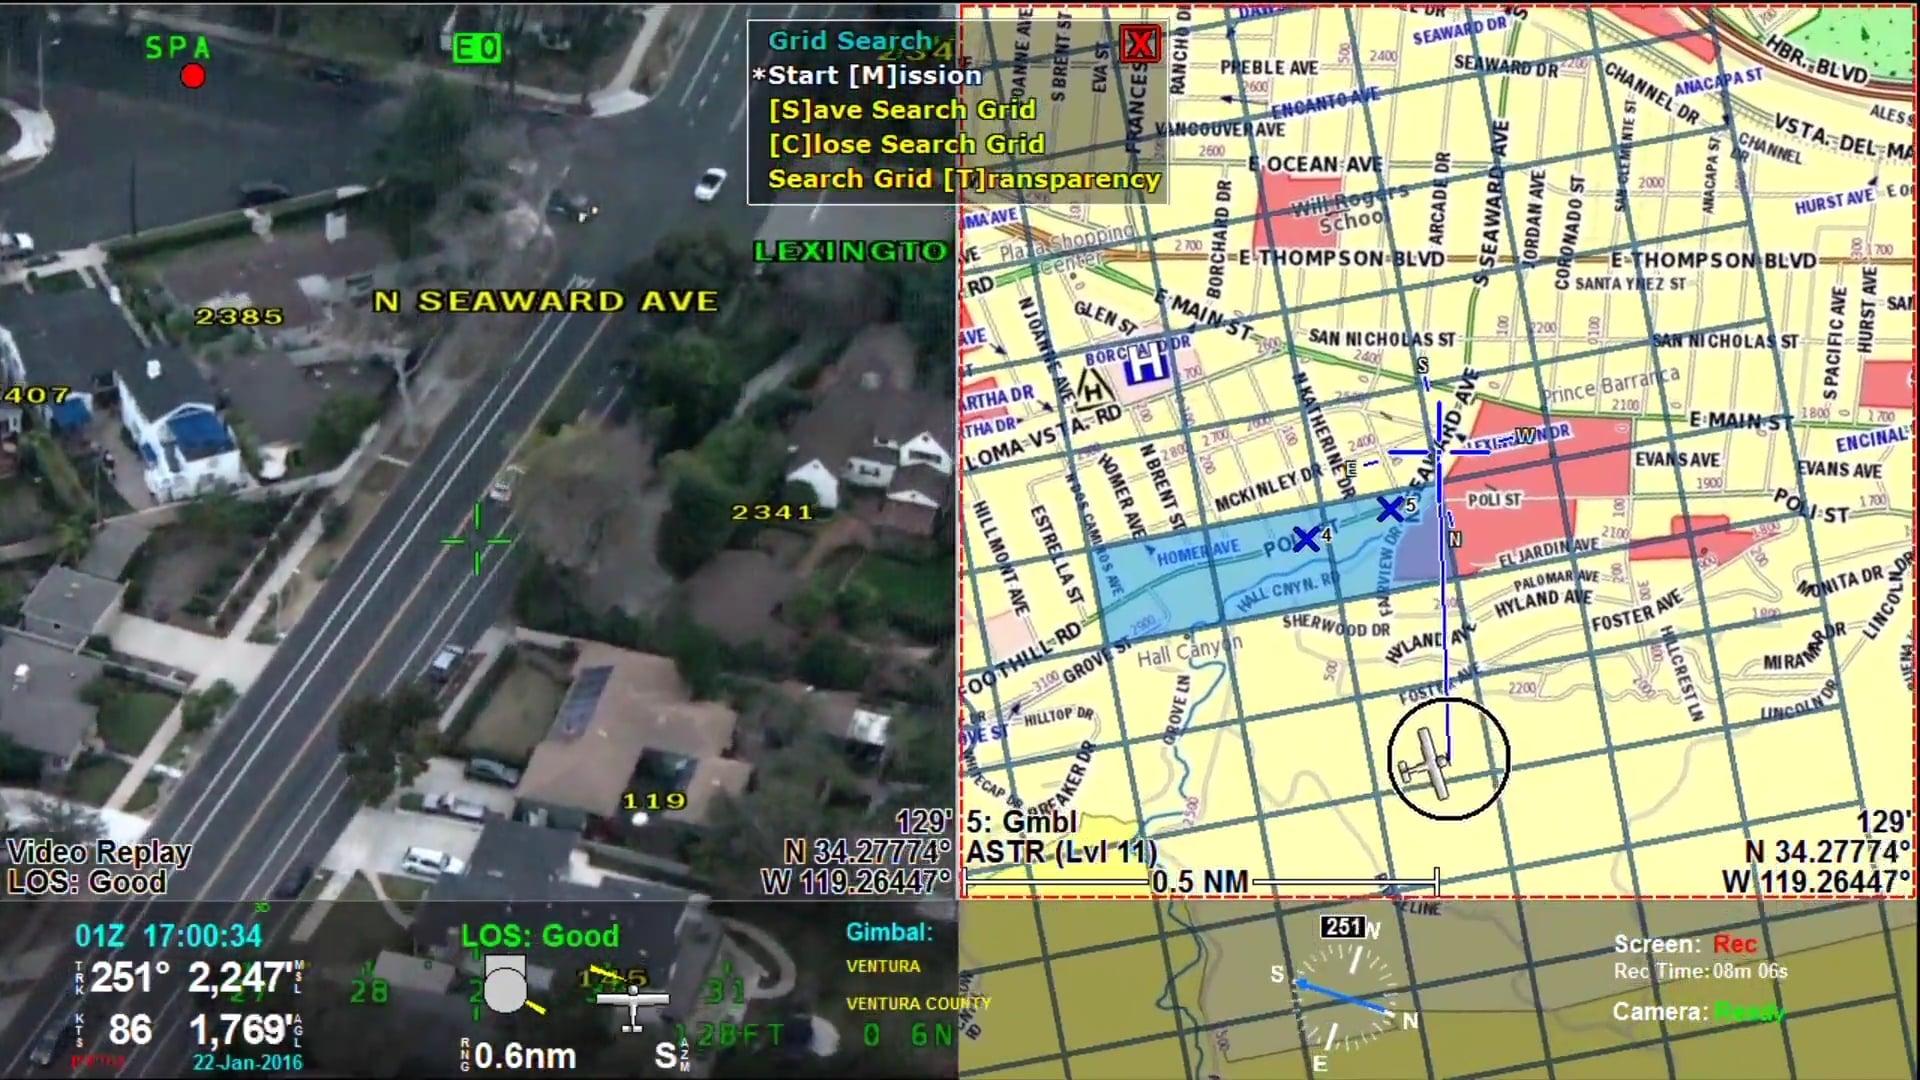 Grid Search in an Urban Environment